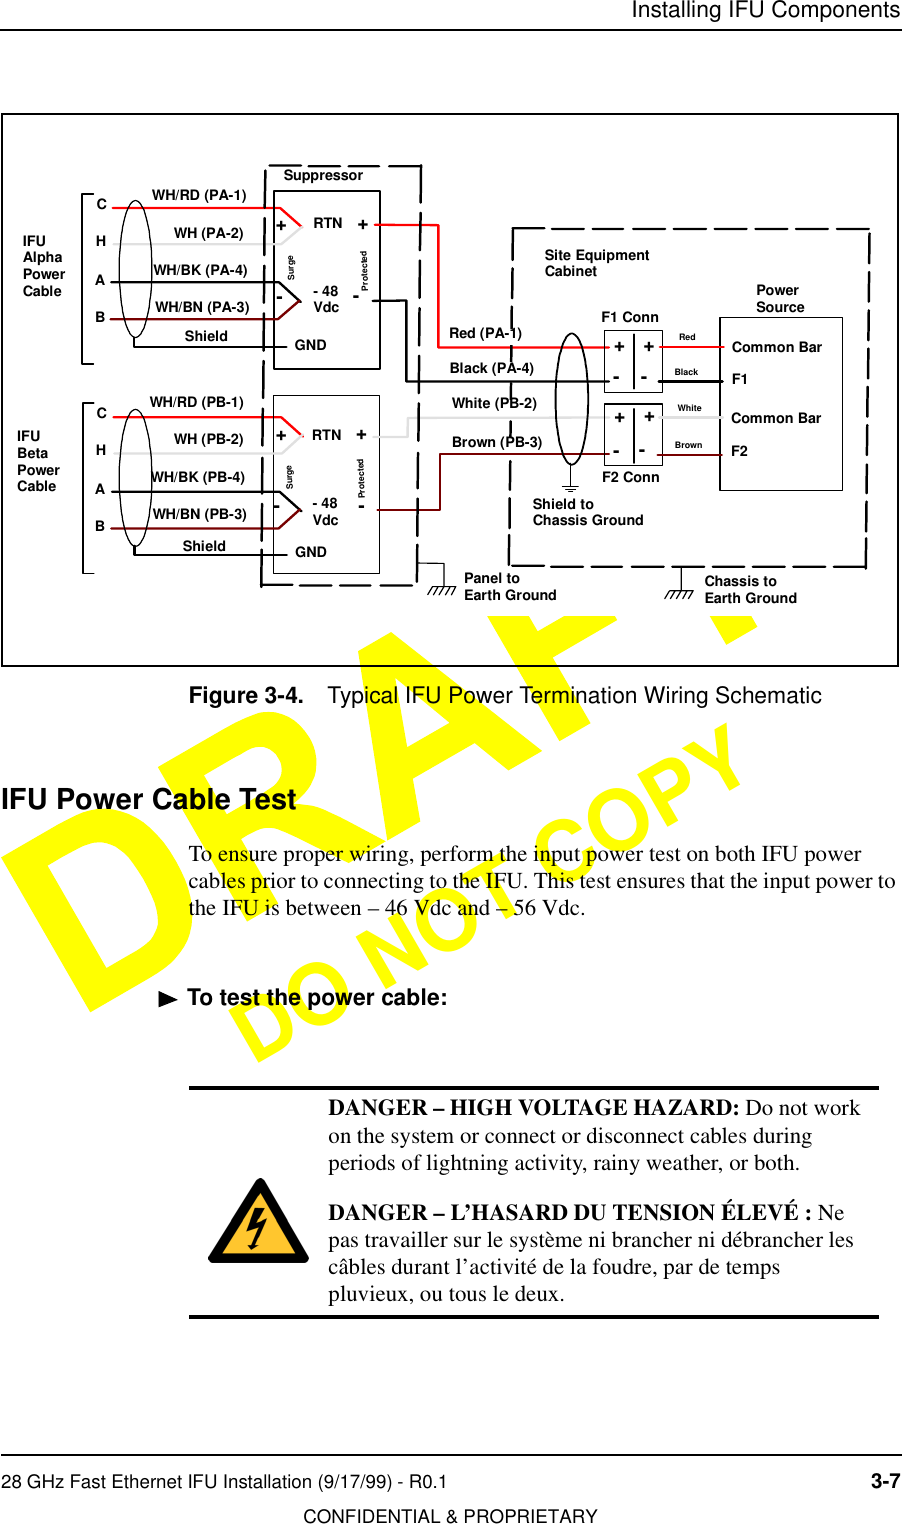 installing ifu components28 ghz fast ethernet ifu installation (9/17/99) -